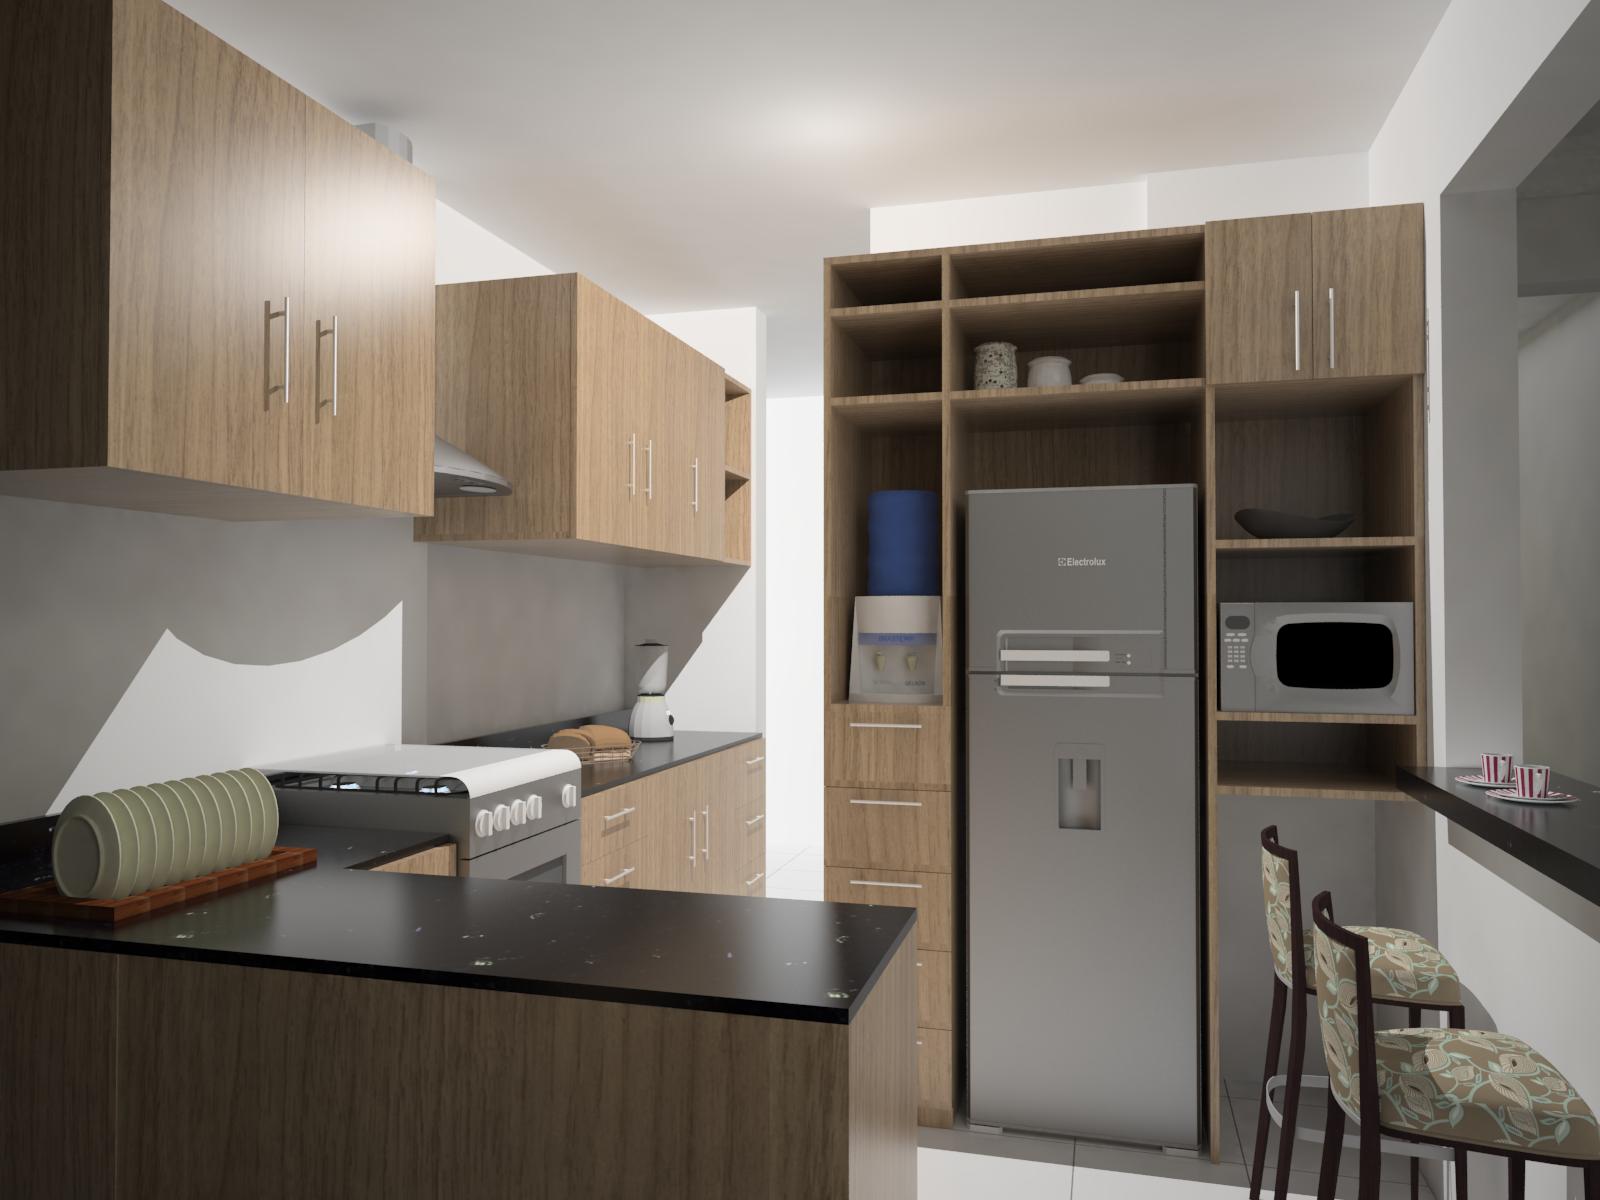 Interiores – Apartamento  #323E5F 1600 1200